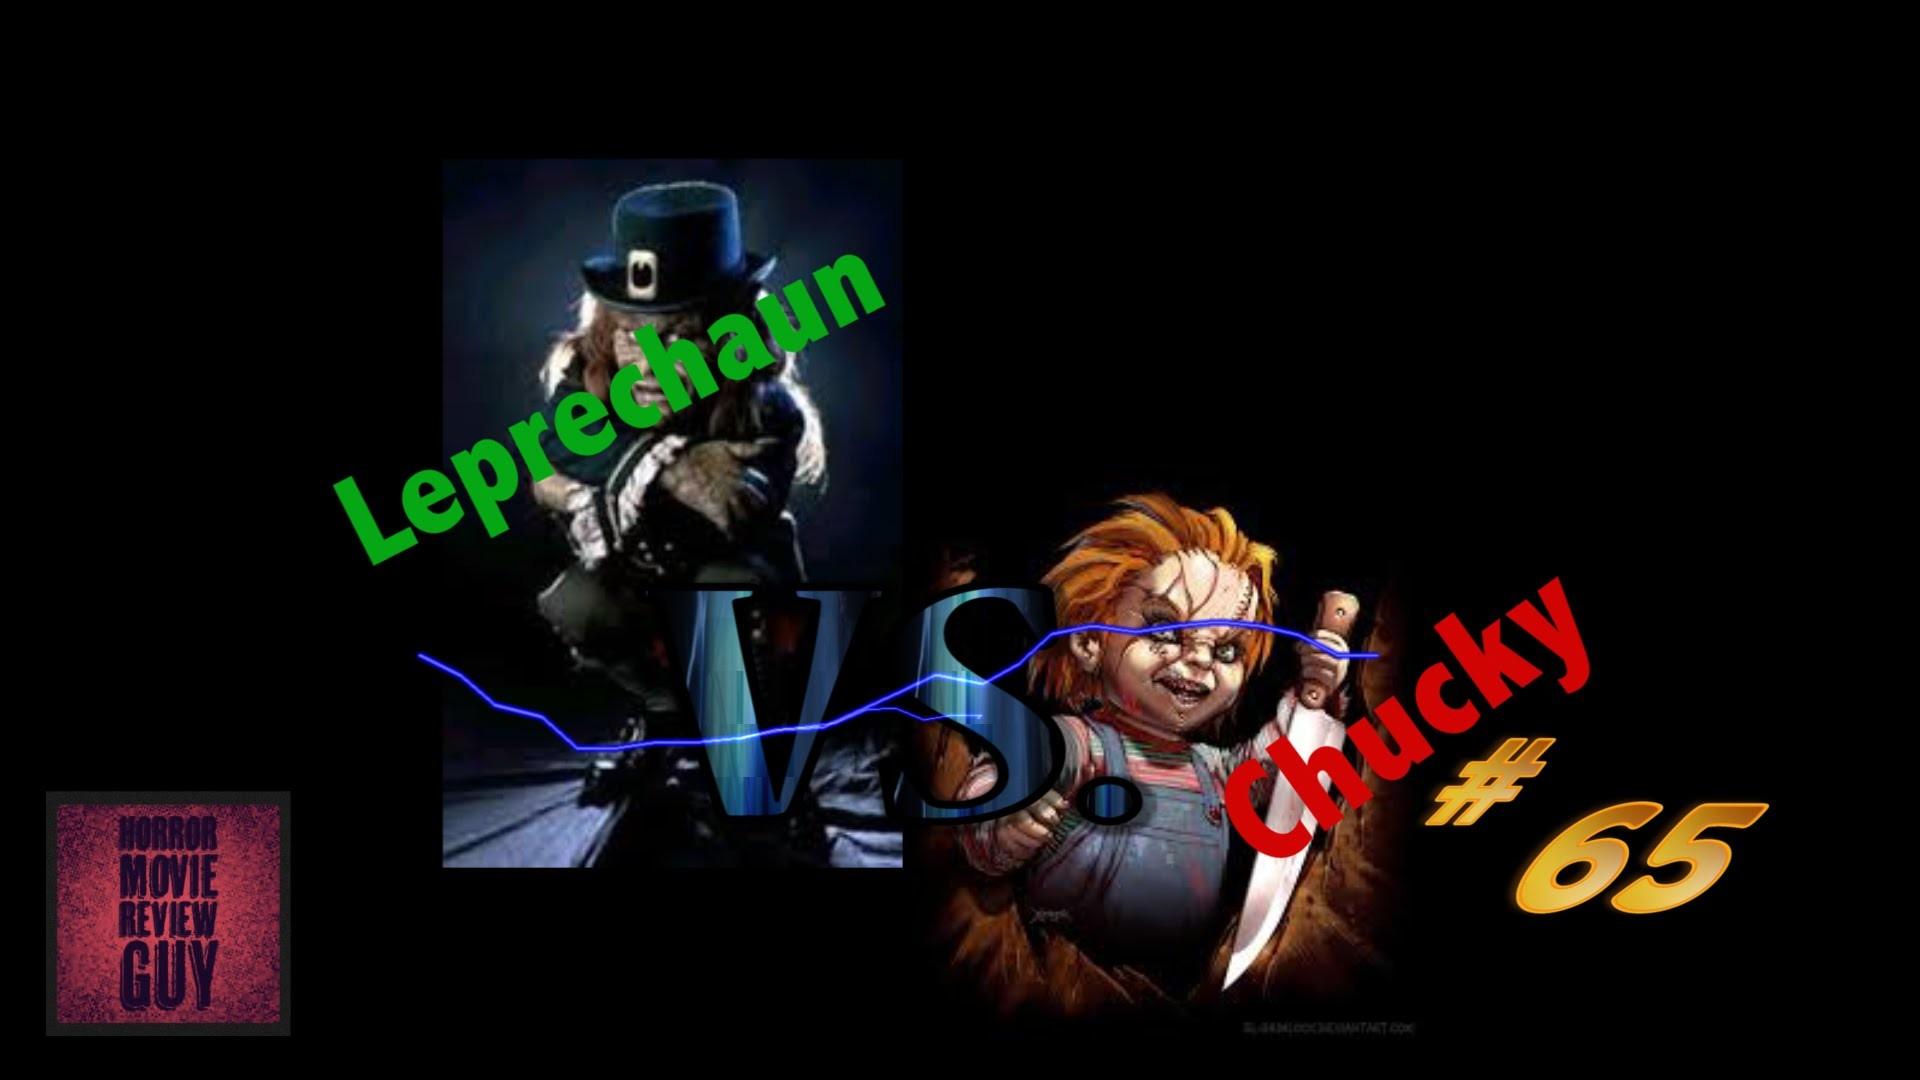 Chucky vs Leprechaun – Horror Movie Review Guy   Vid 65  